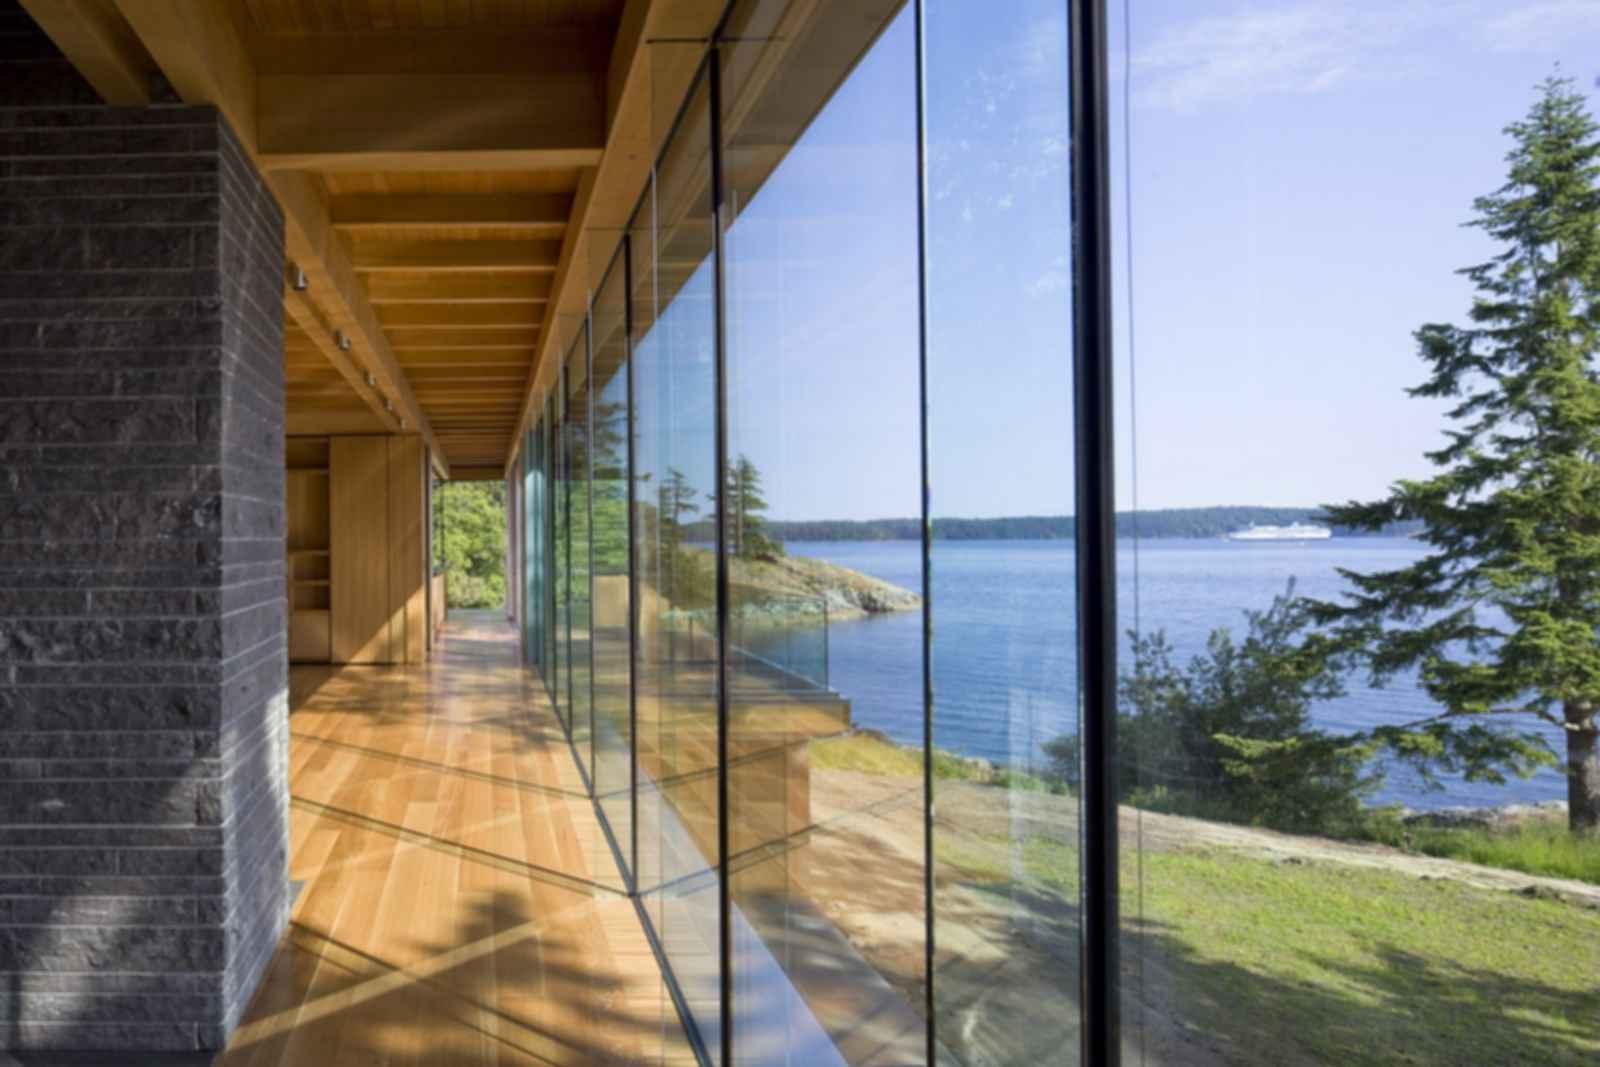 Gulf Islands Residence - Interior/Hallway